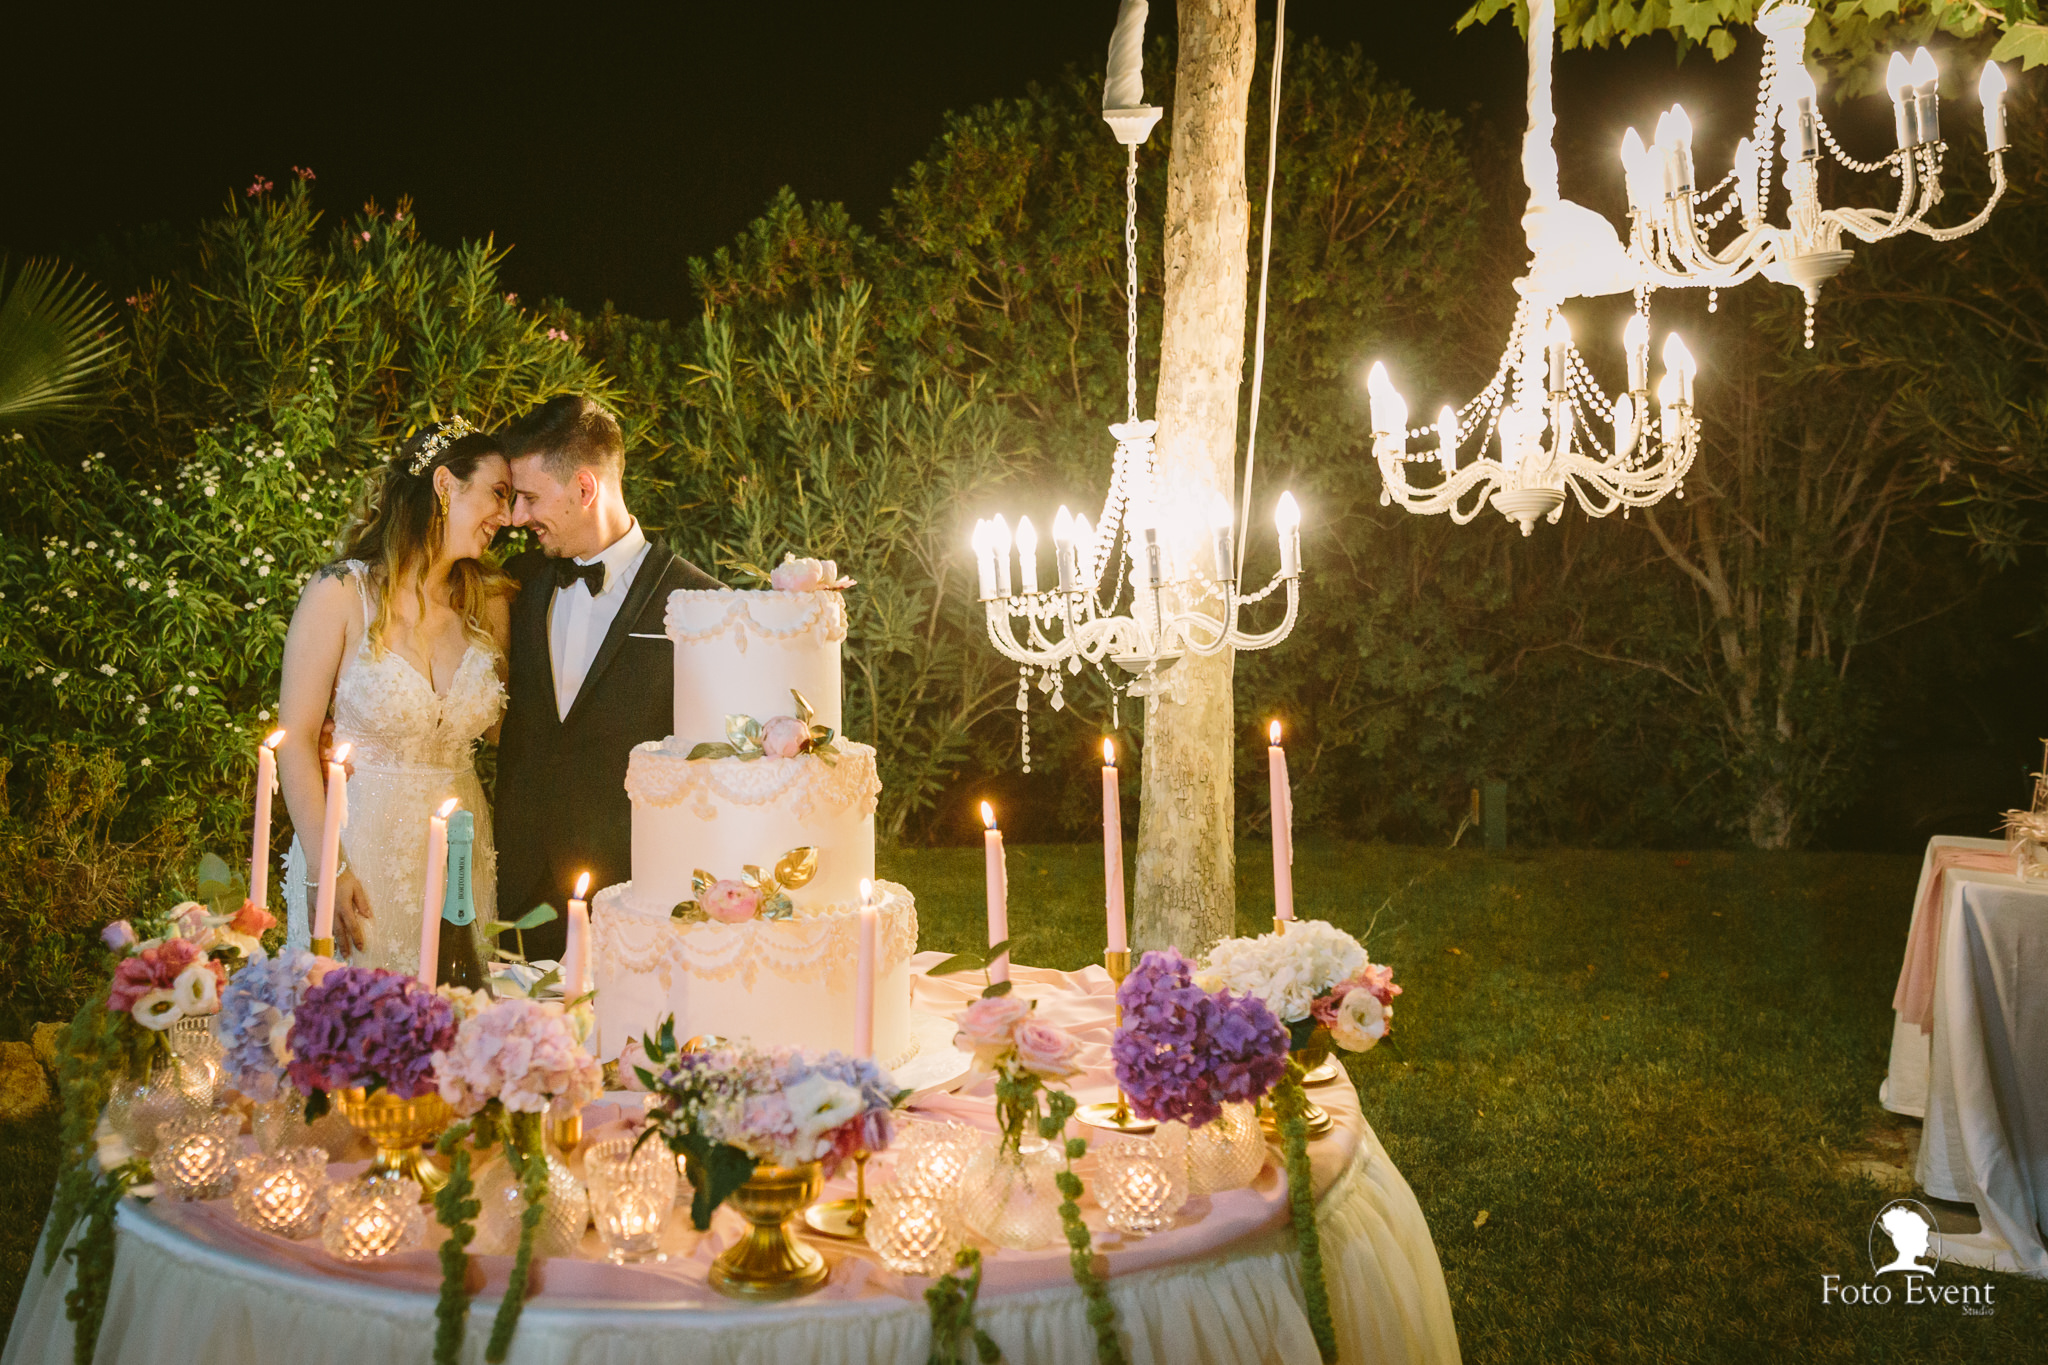 076-2019-08-23-Matrimonio-Angela-e-Nicola-Iaconis-030